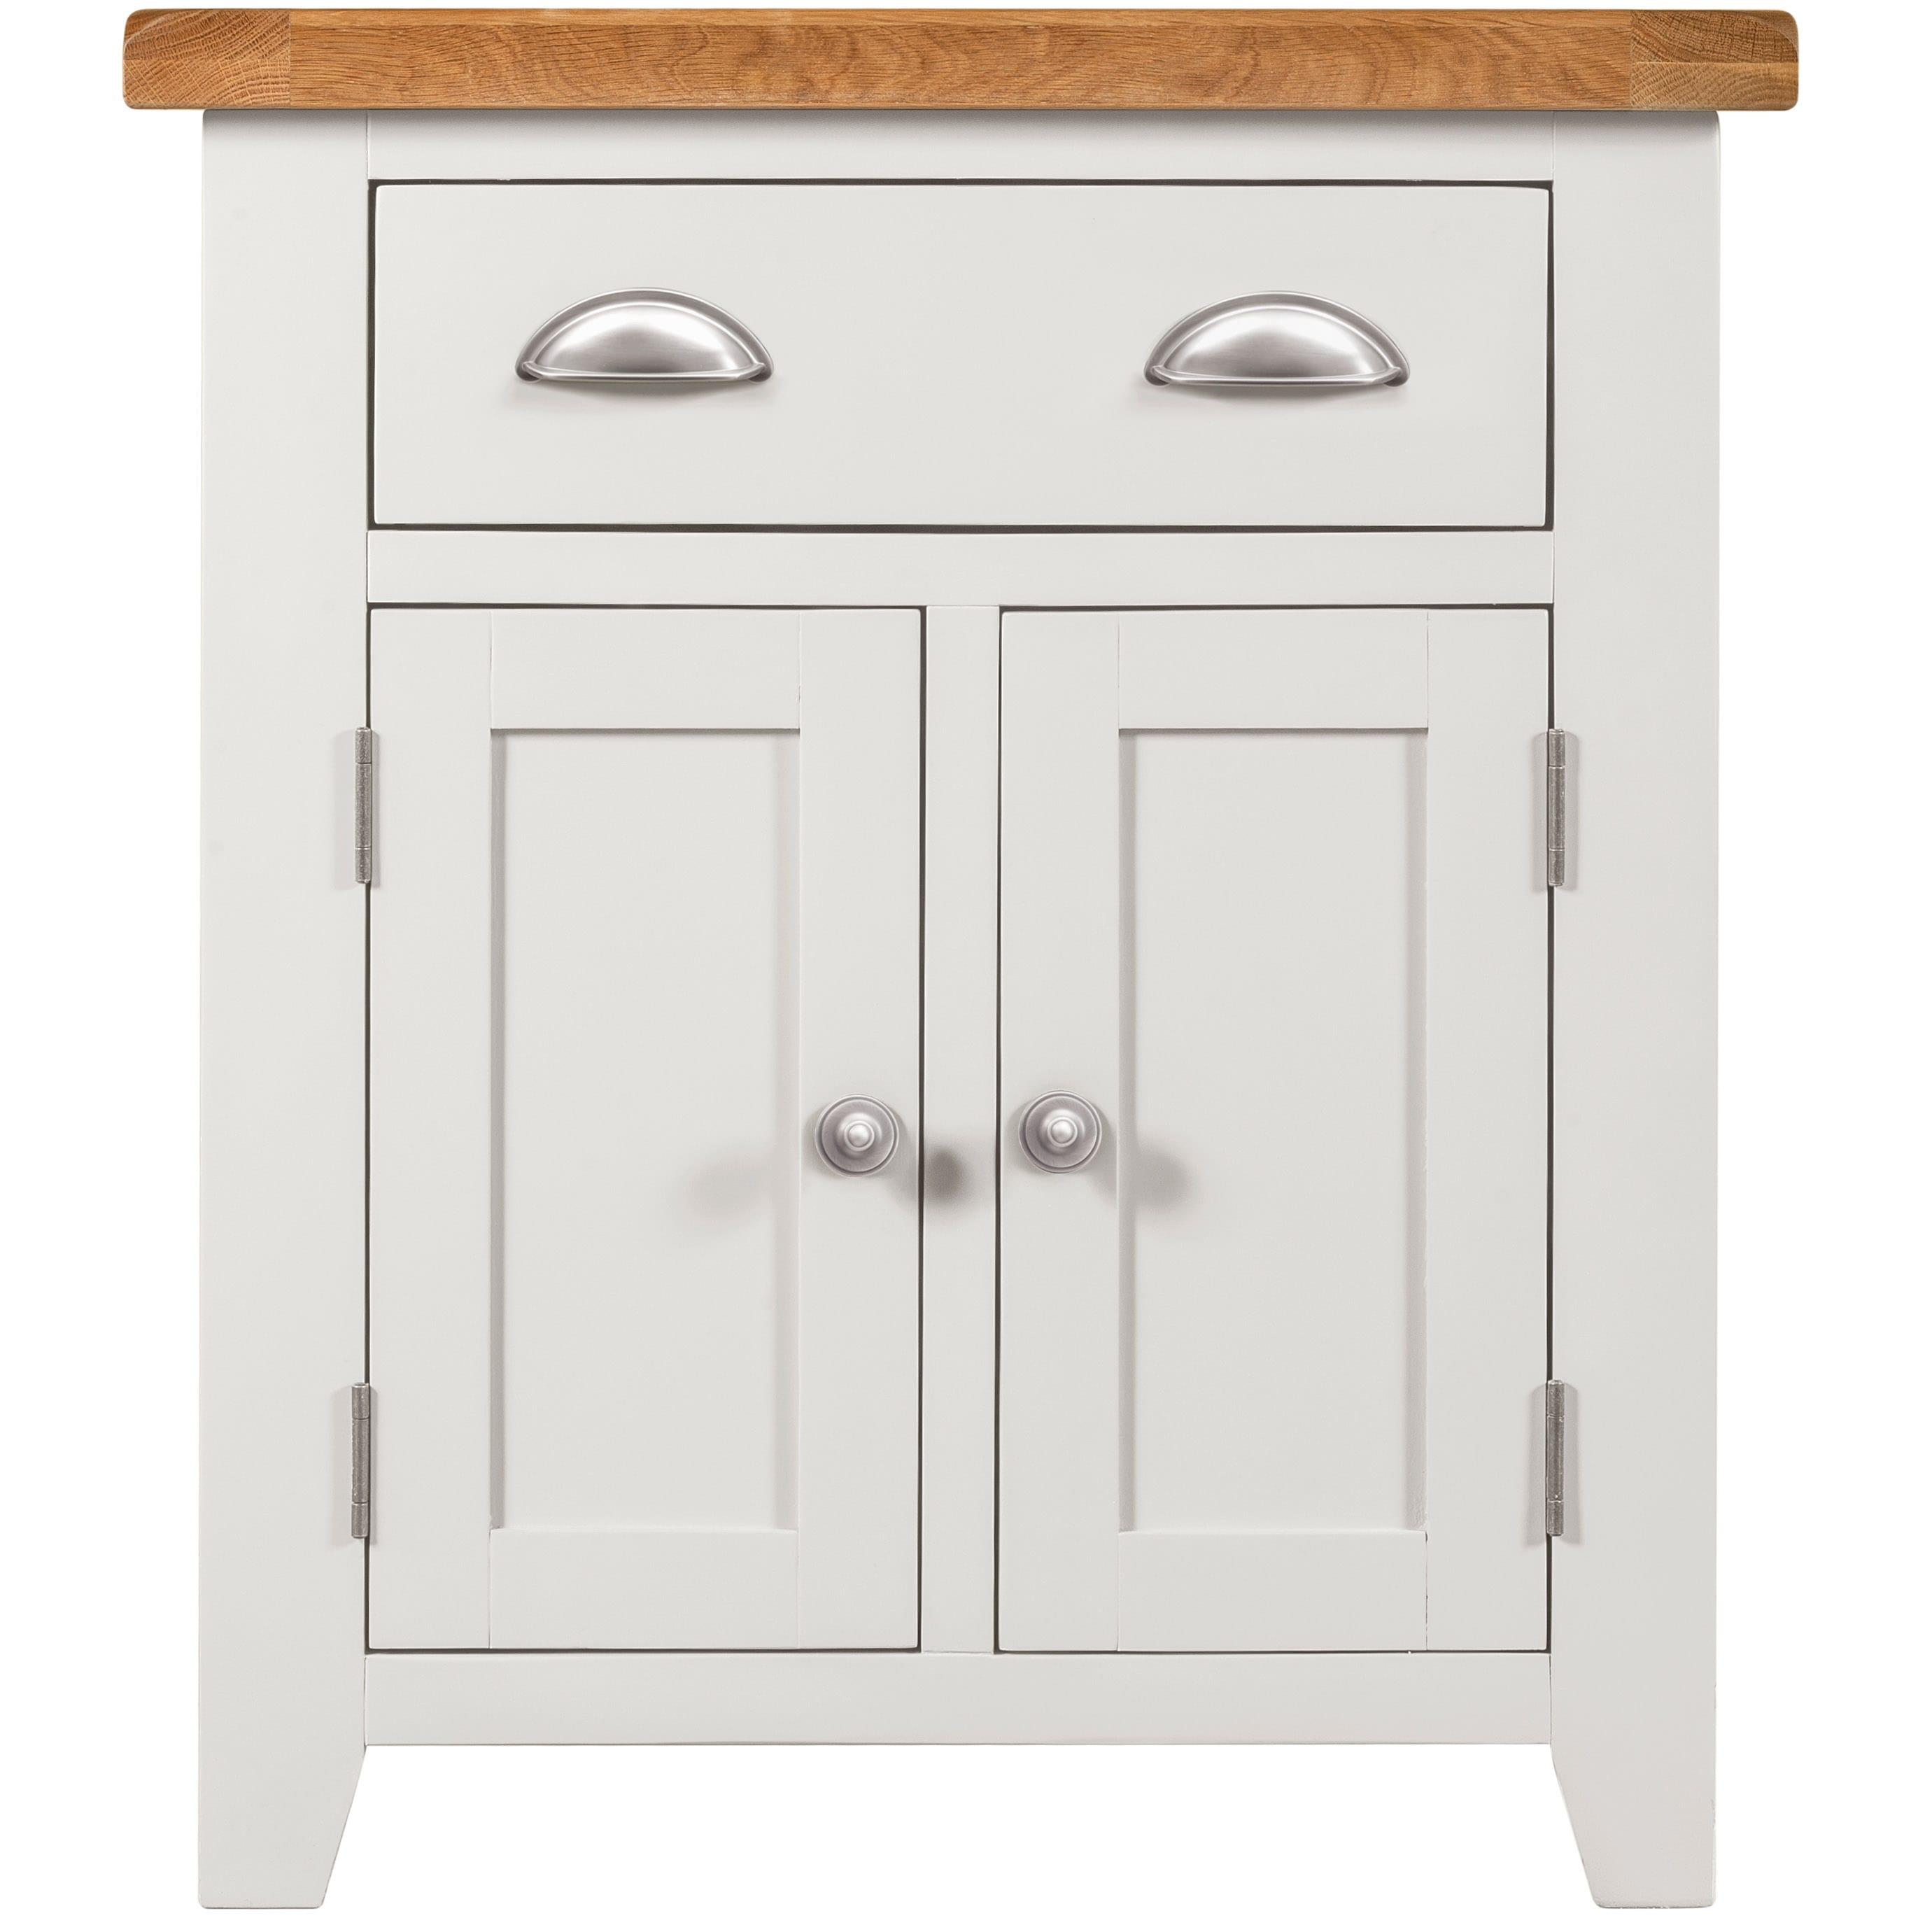 Willow White 2 Door 1 Drawer Sideboard